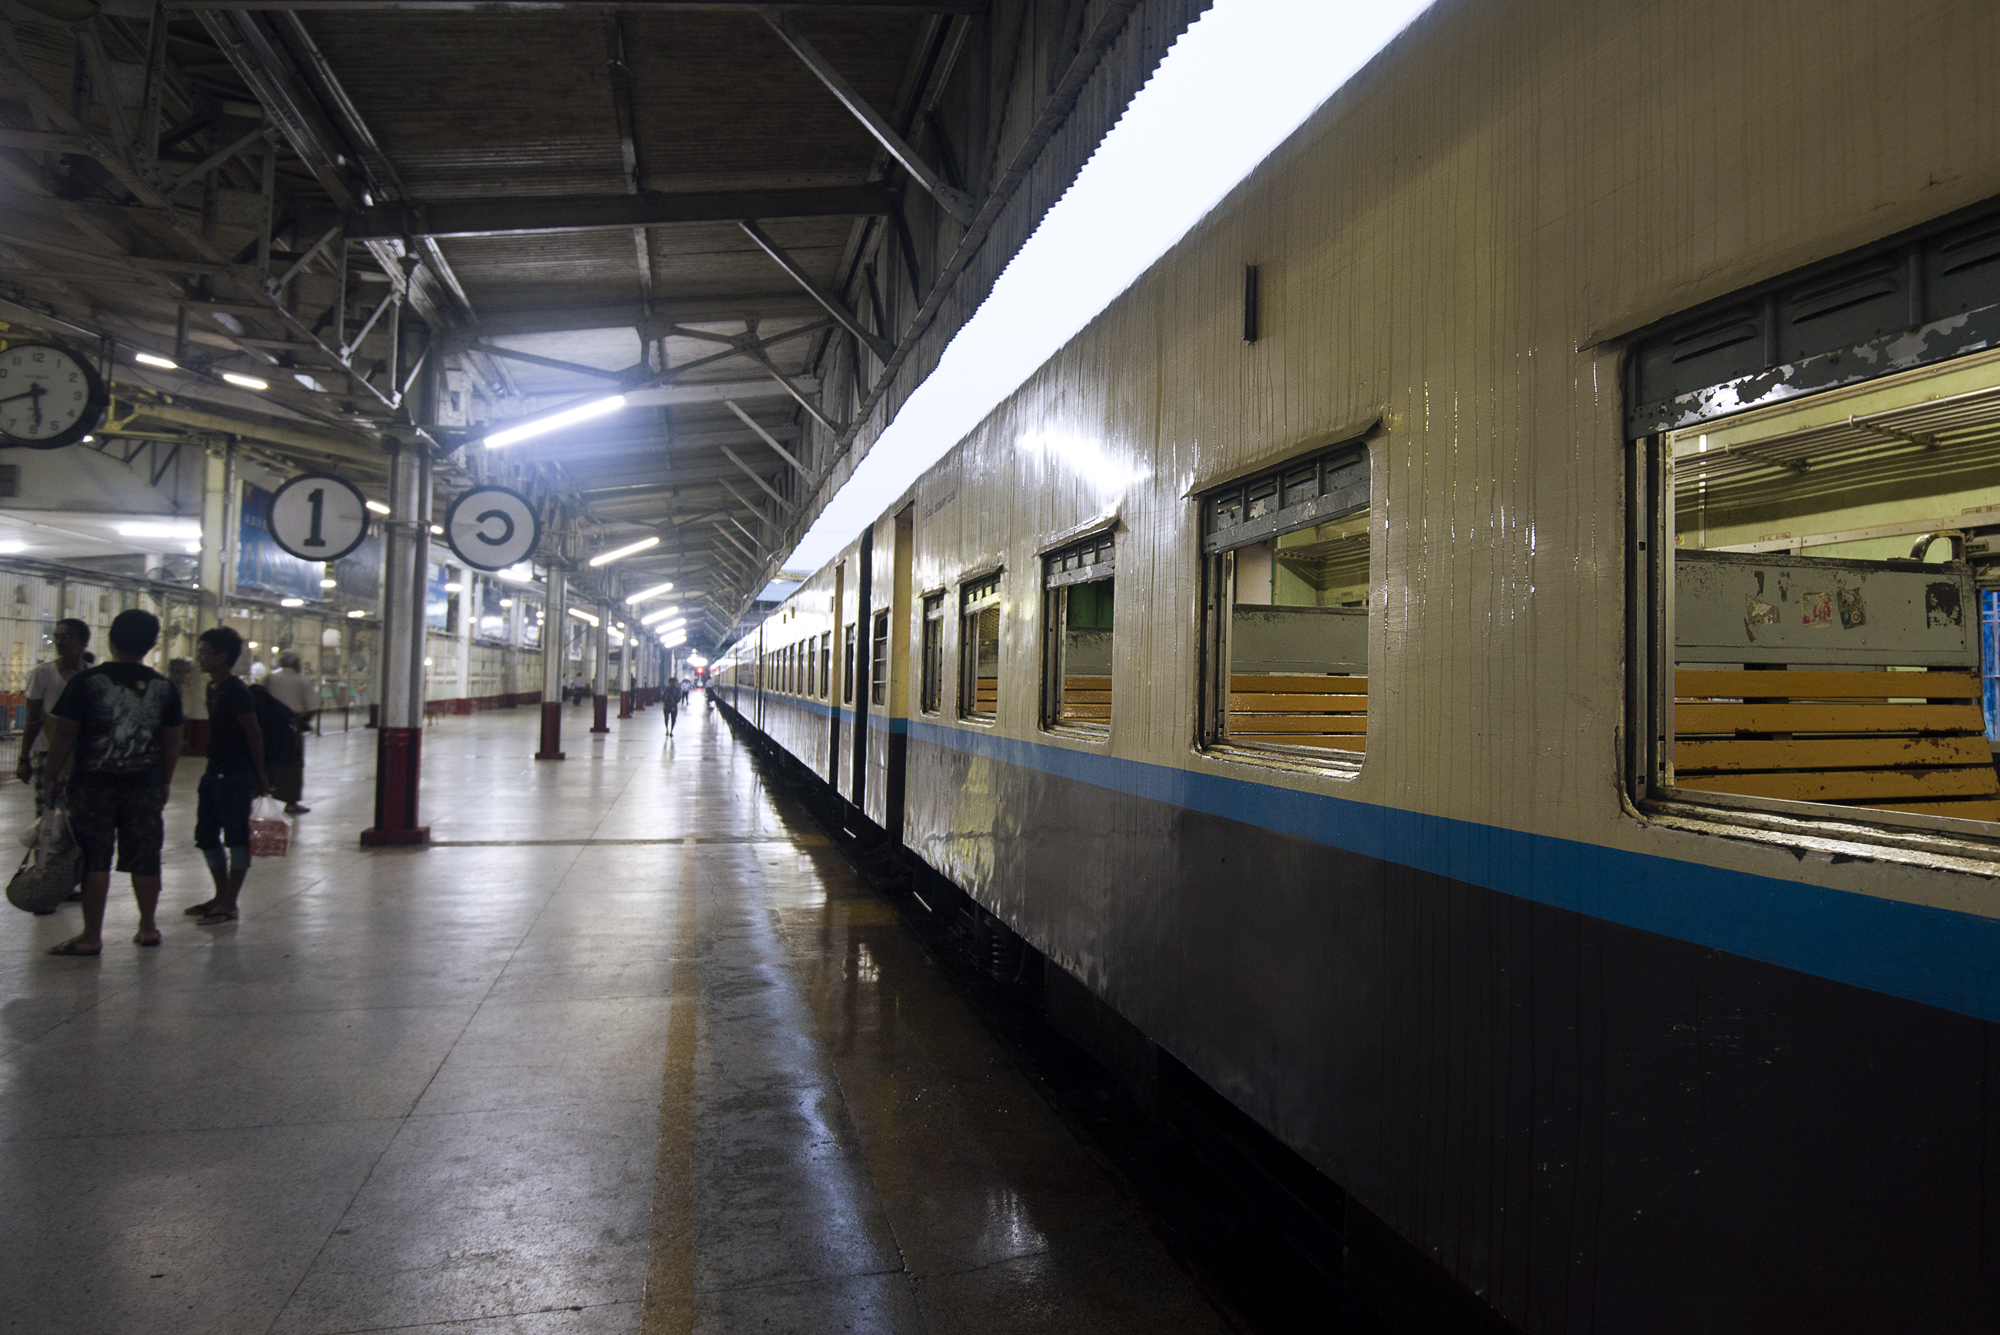 Yangon Central Station - The Mandalay Express waits to depart